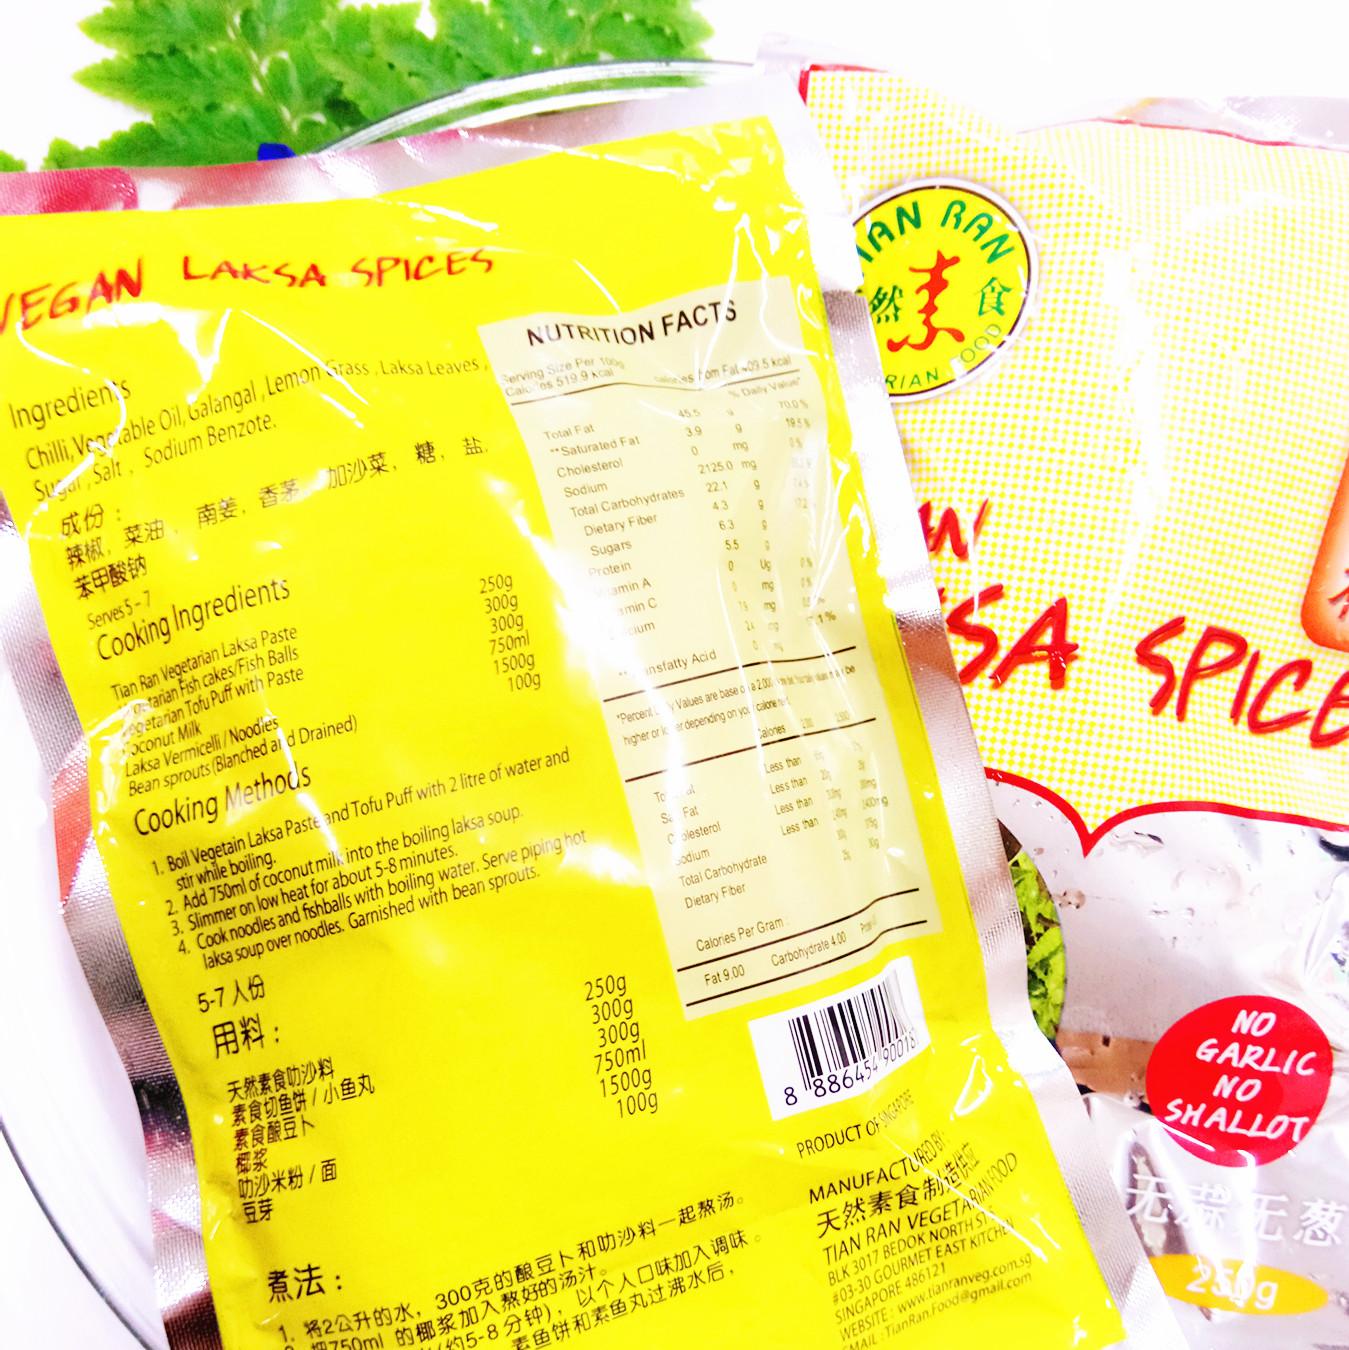 Image Tianran Vegan Premixed Laksa (Paste) Spices 天然-素叻沙料 250grams